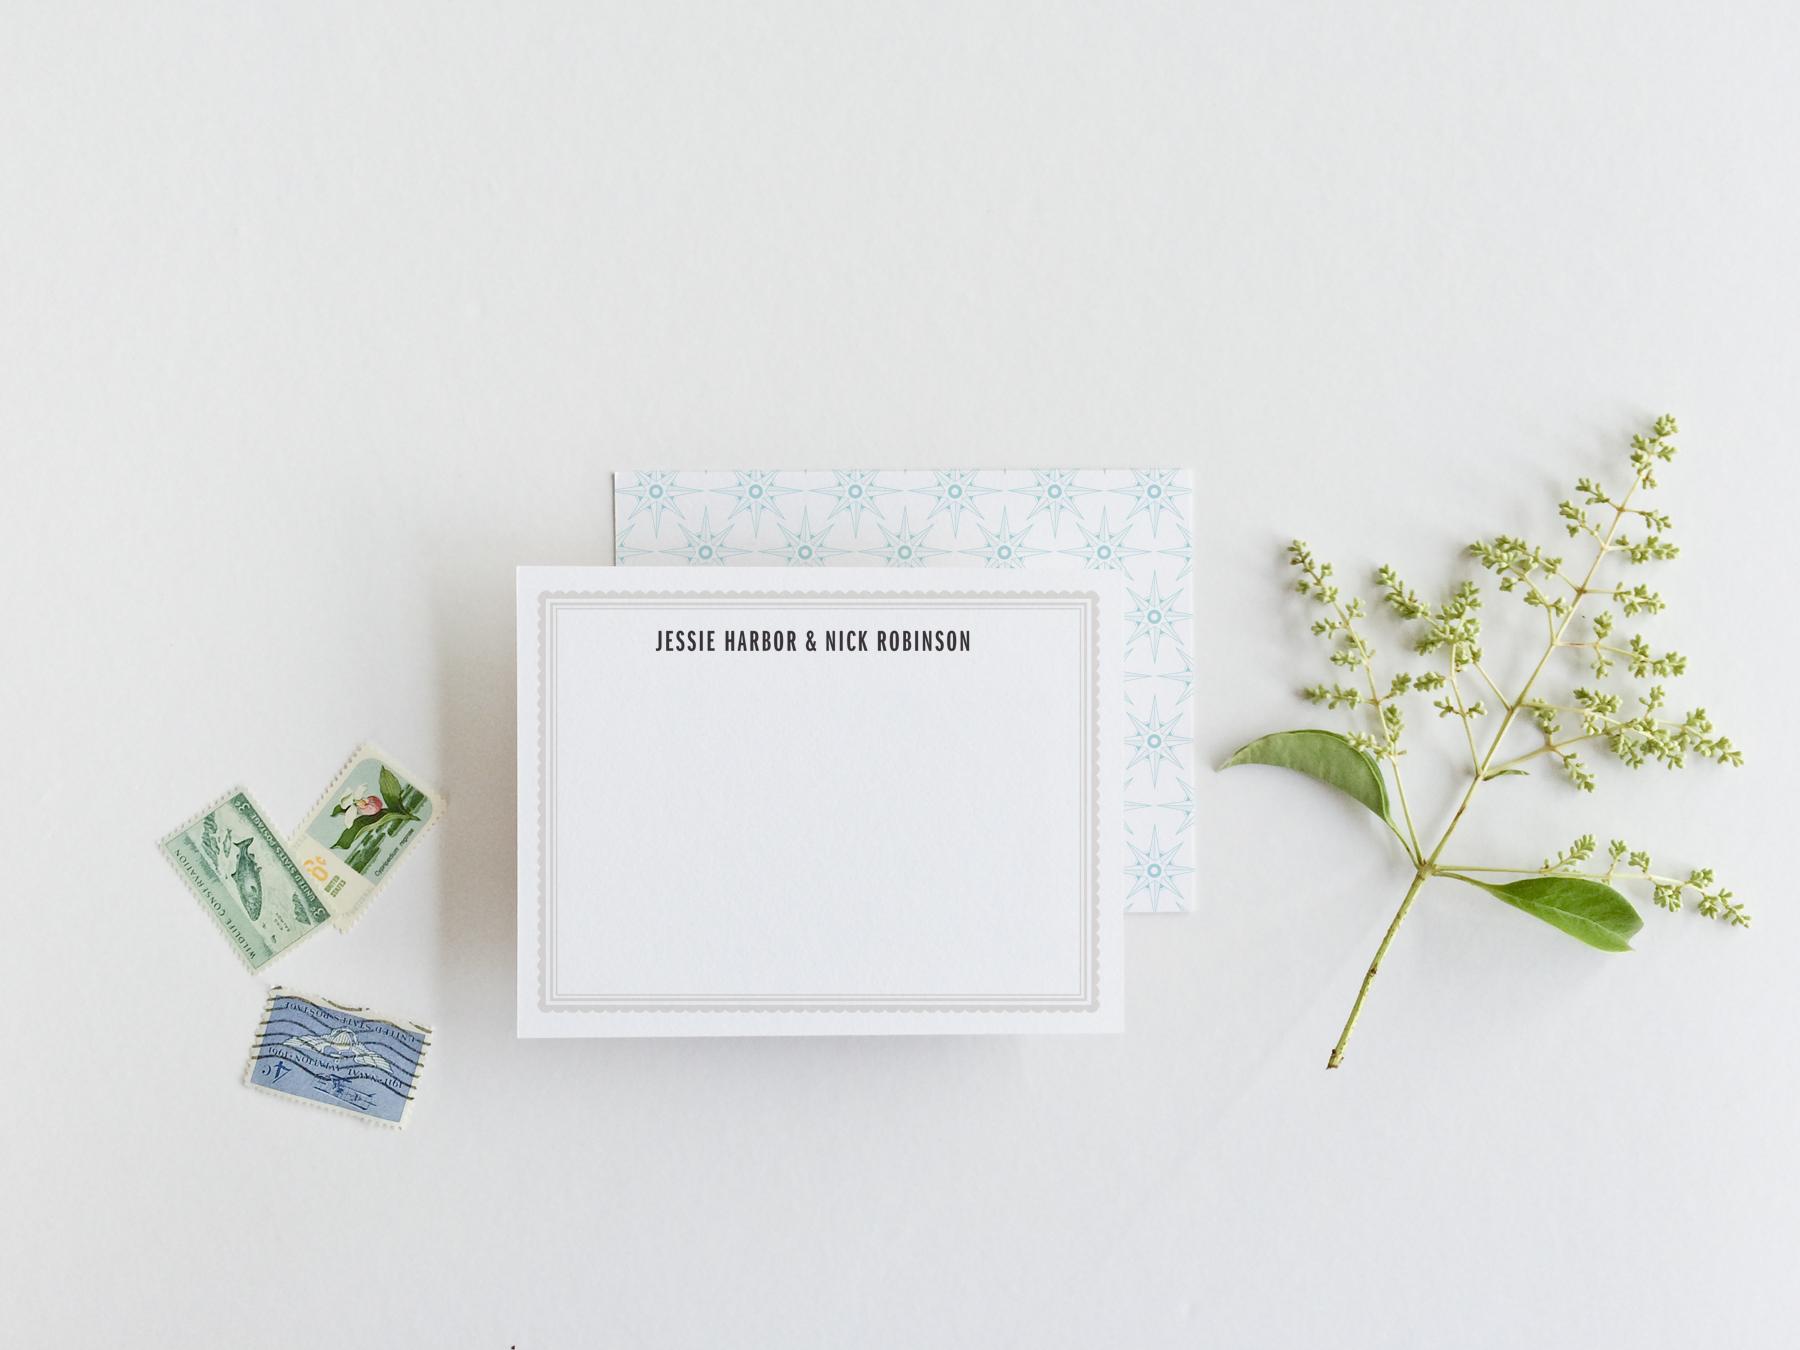 destination-wedding-thankyou-card.jpg